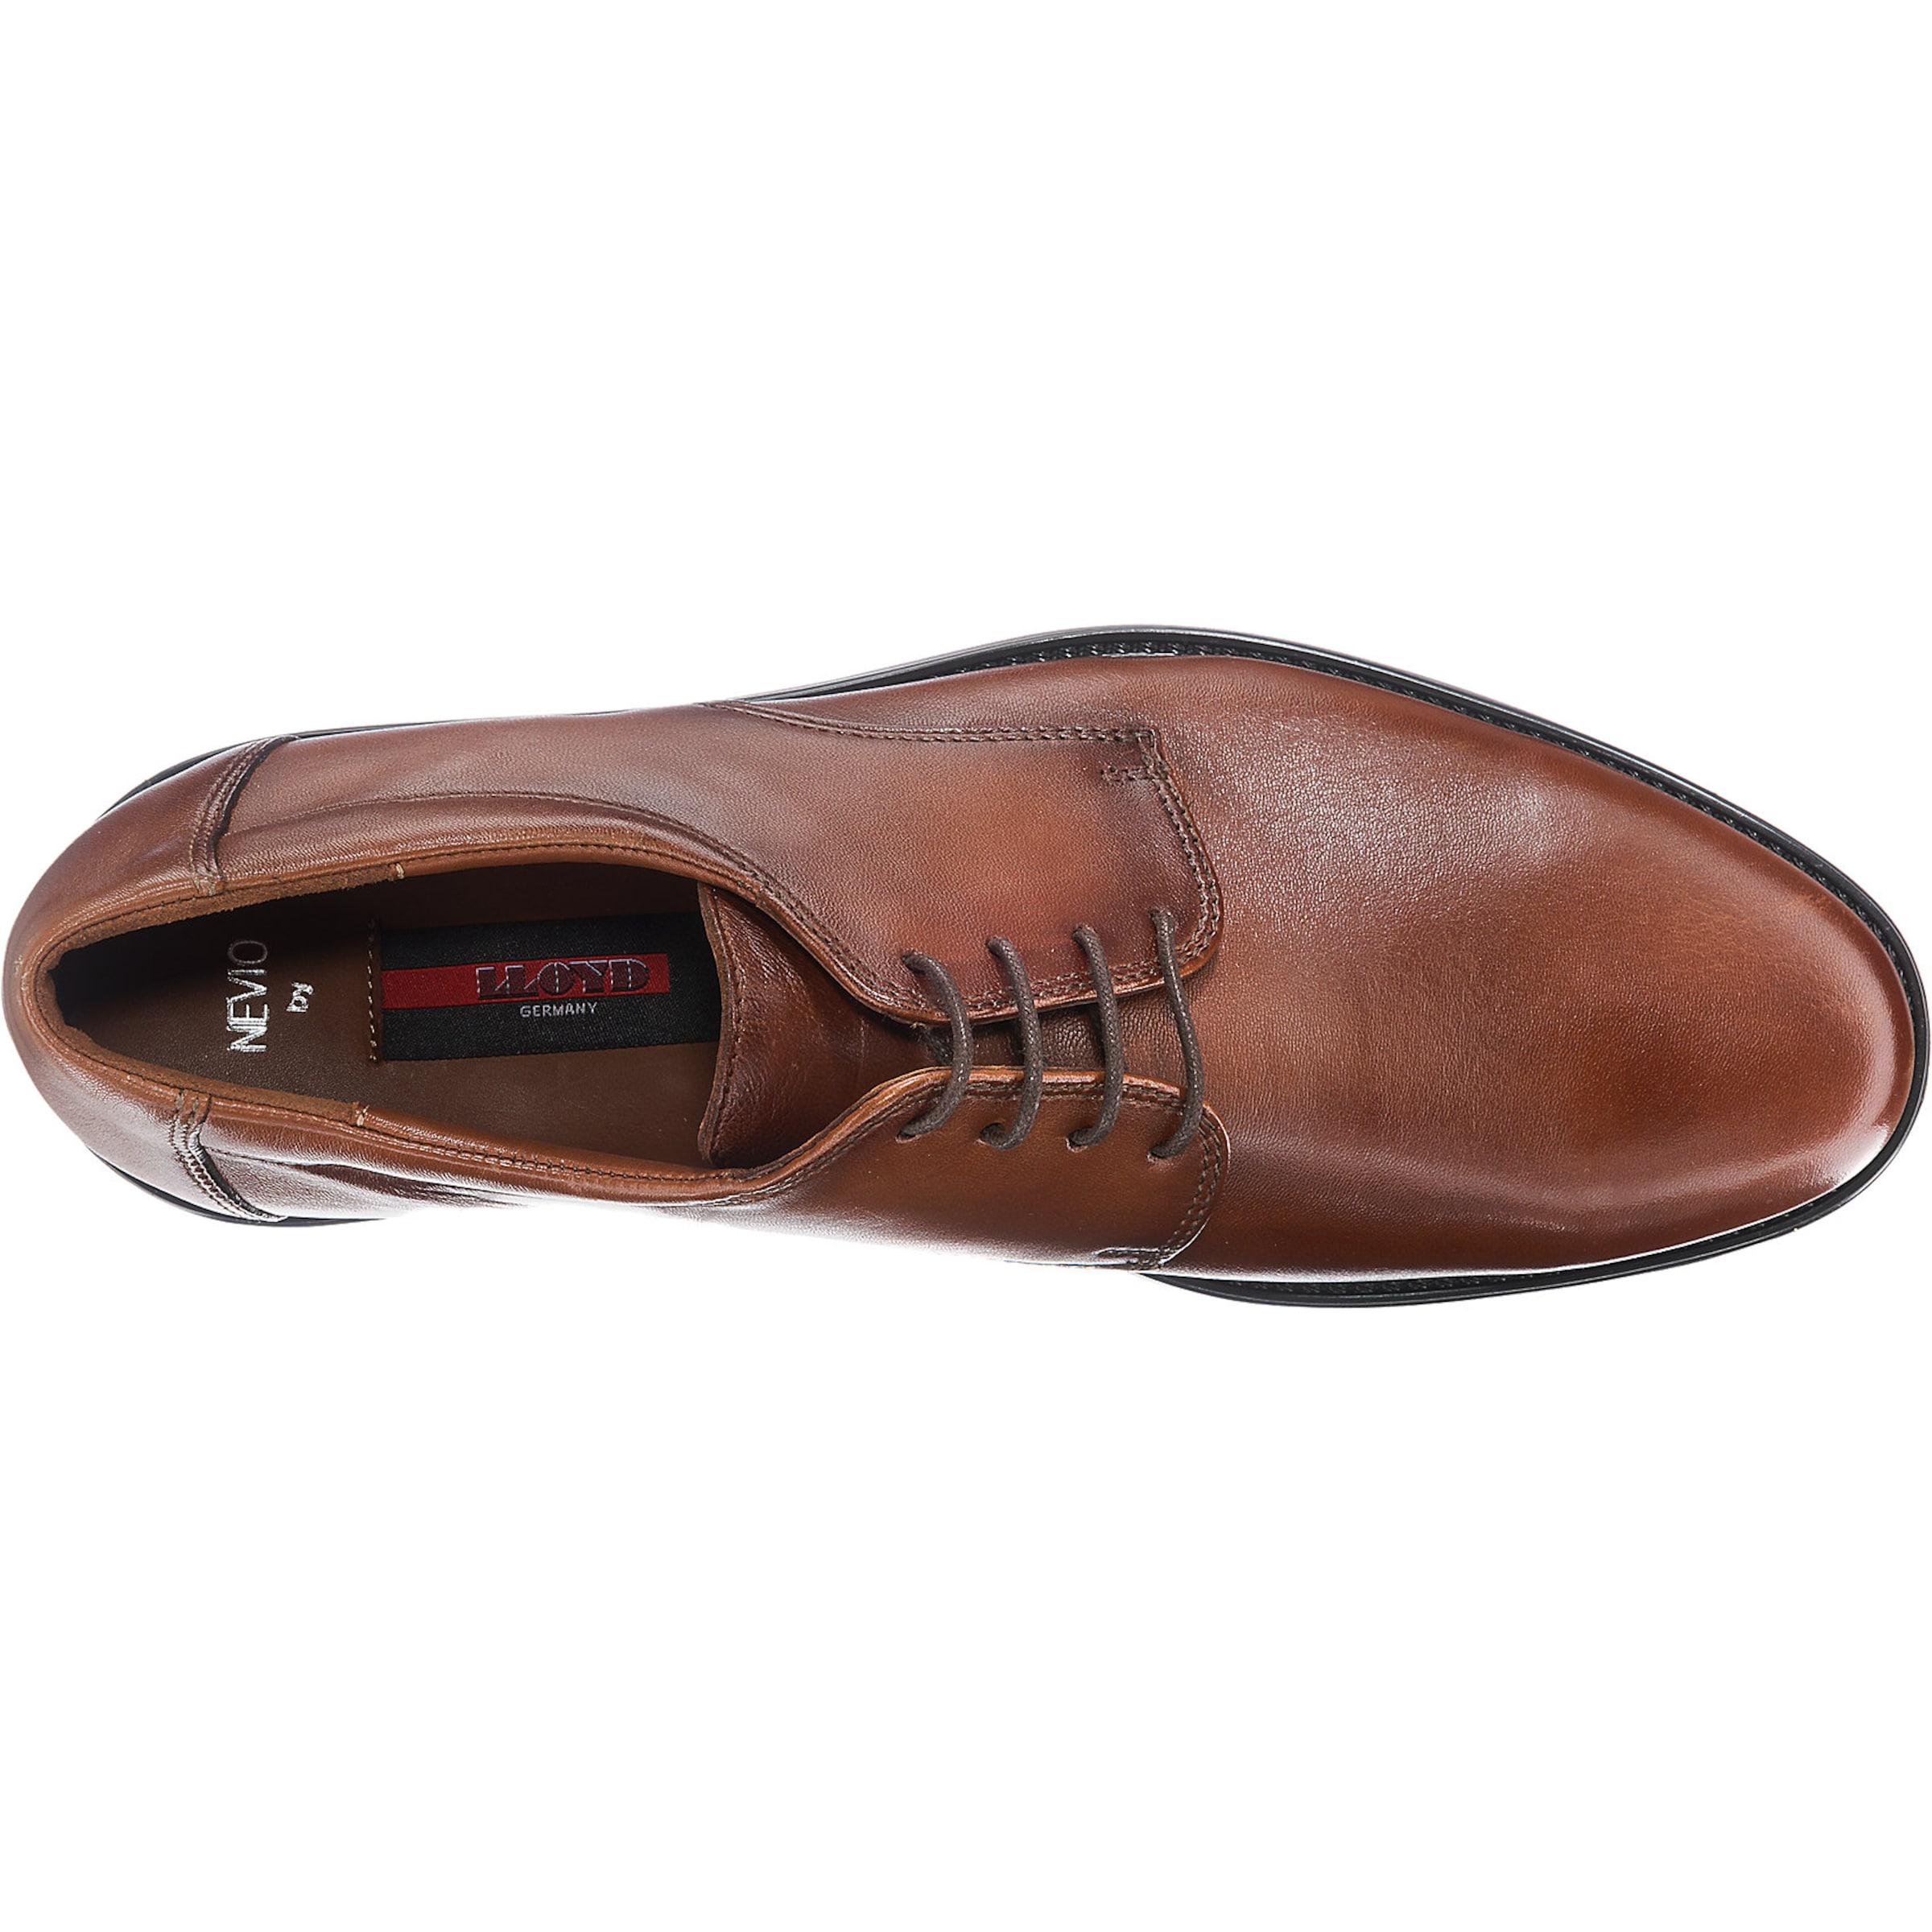 Lloyd Business Schuhe Braun Braun Schuhe In Lloyd Business In QBEdCxerWo